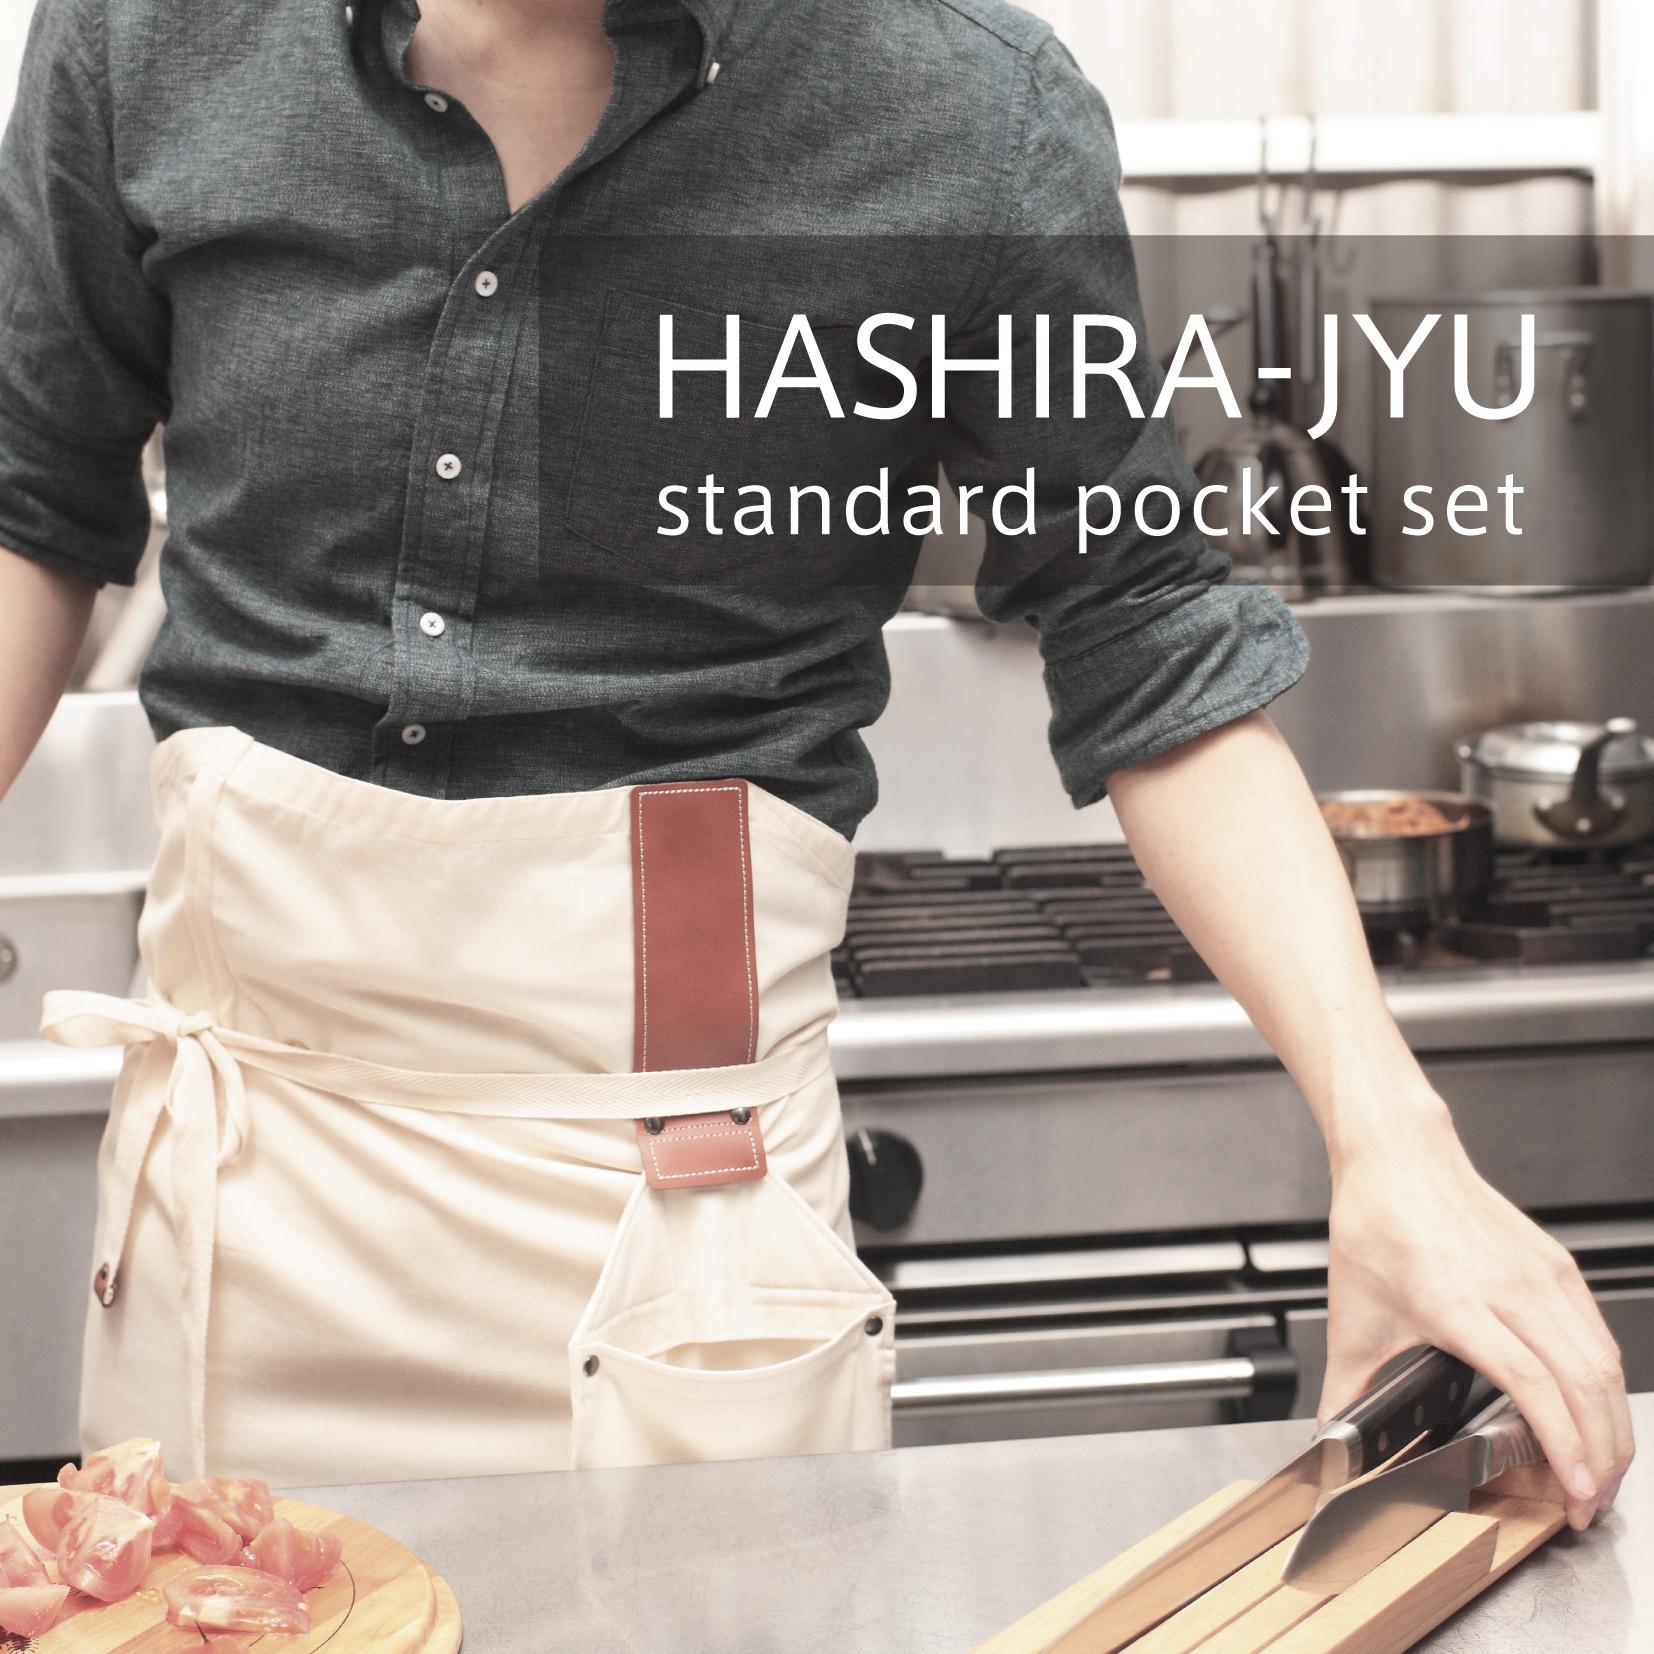 HASHIRA-JYU standard pocket set